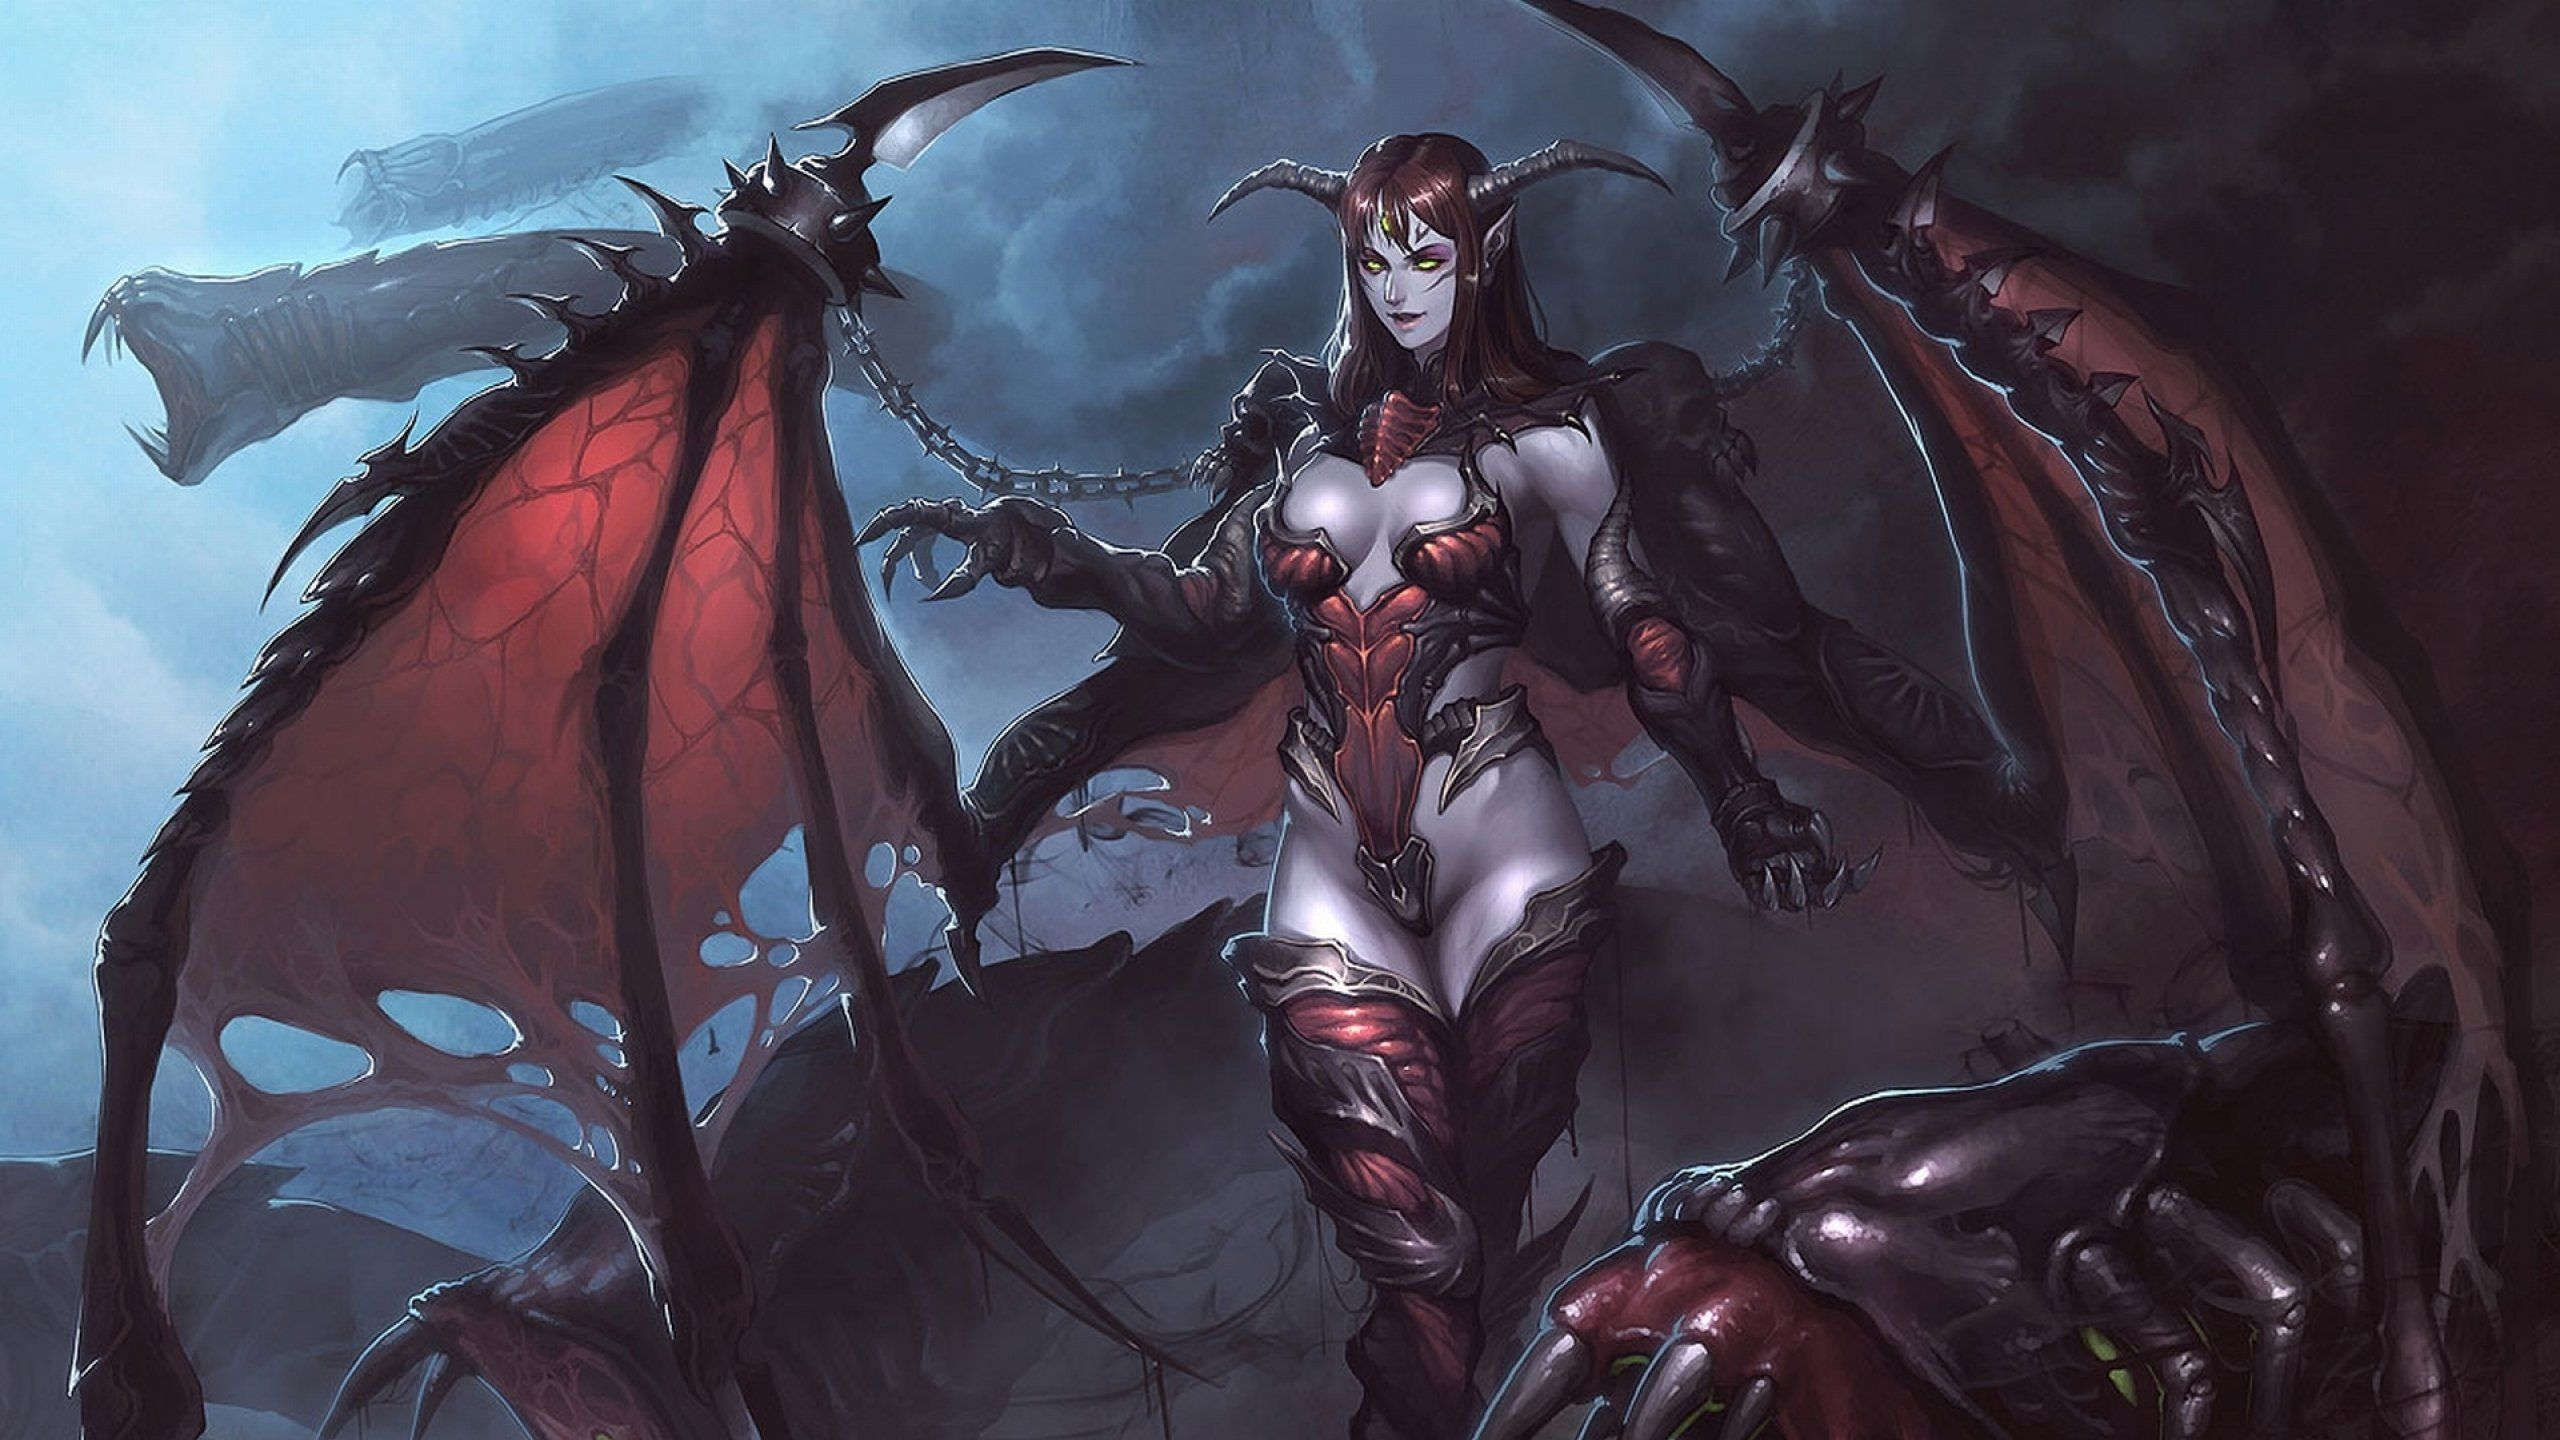 Fantasy demon dark art artwork wallpaper 2560x1440